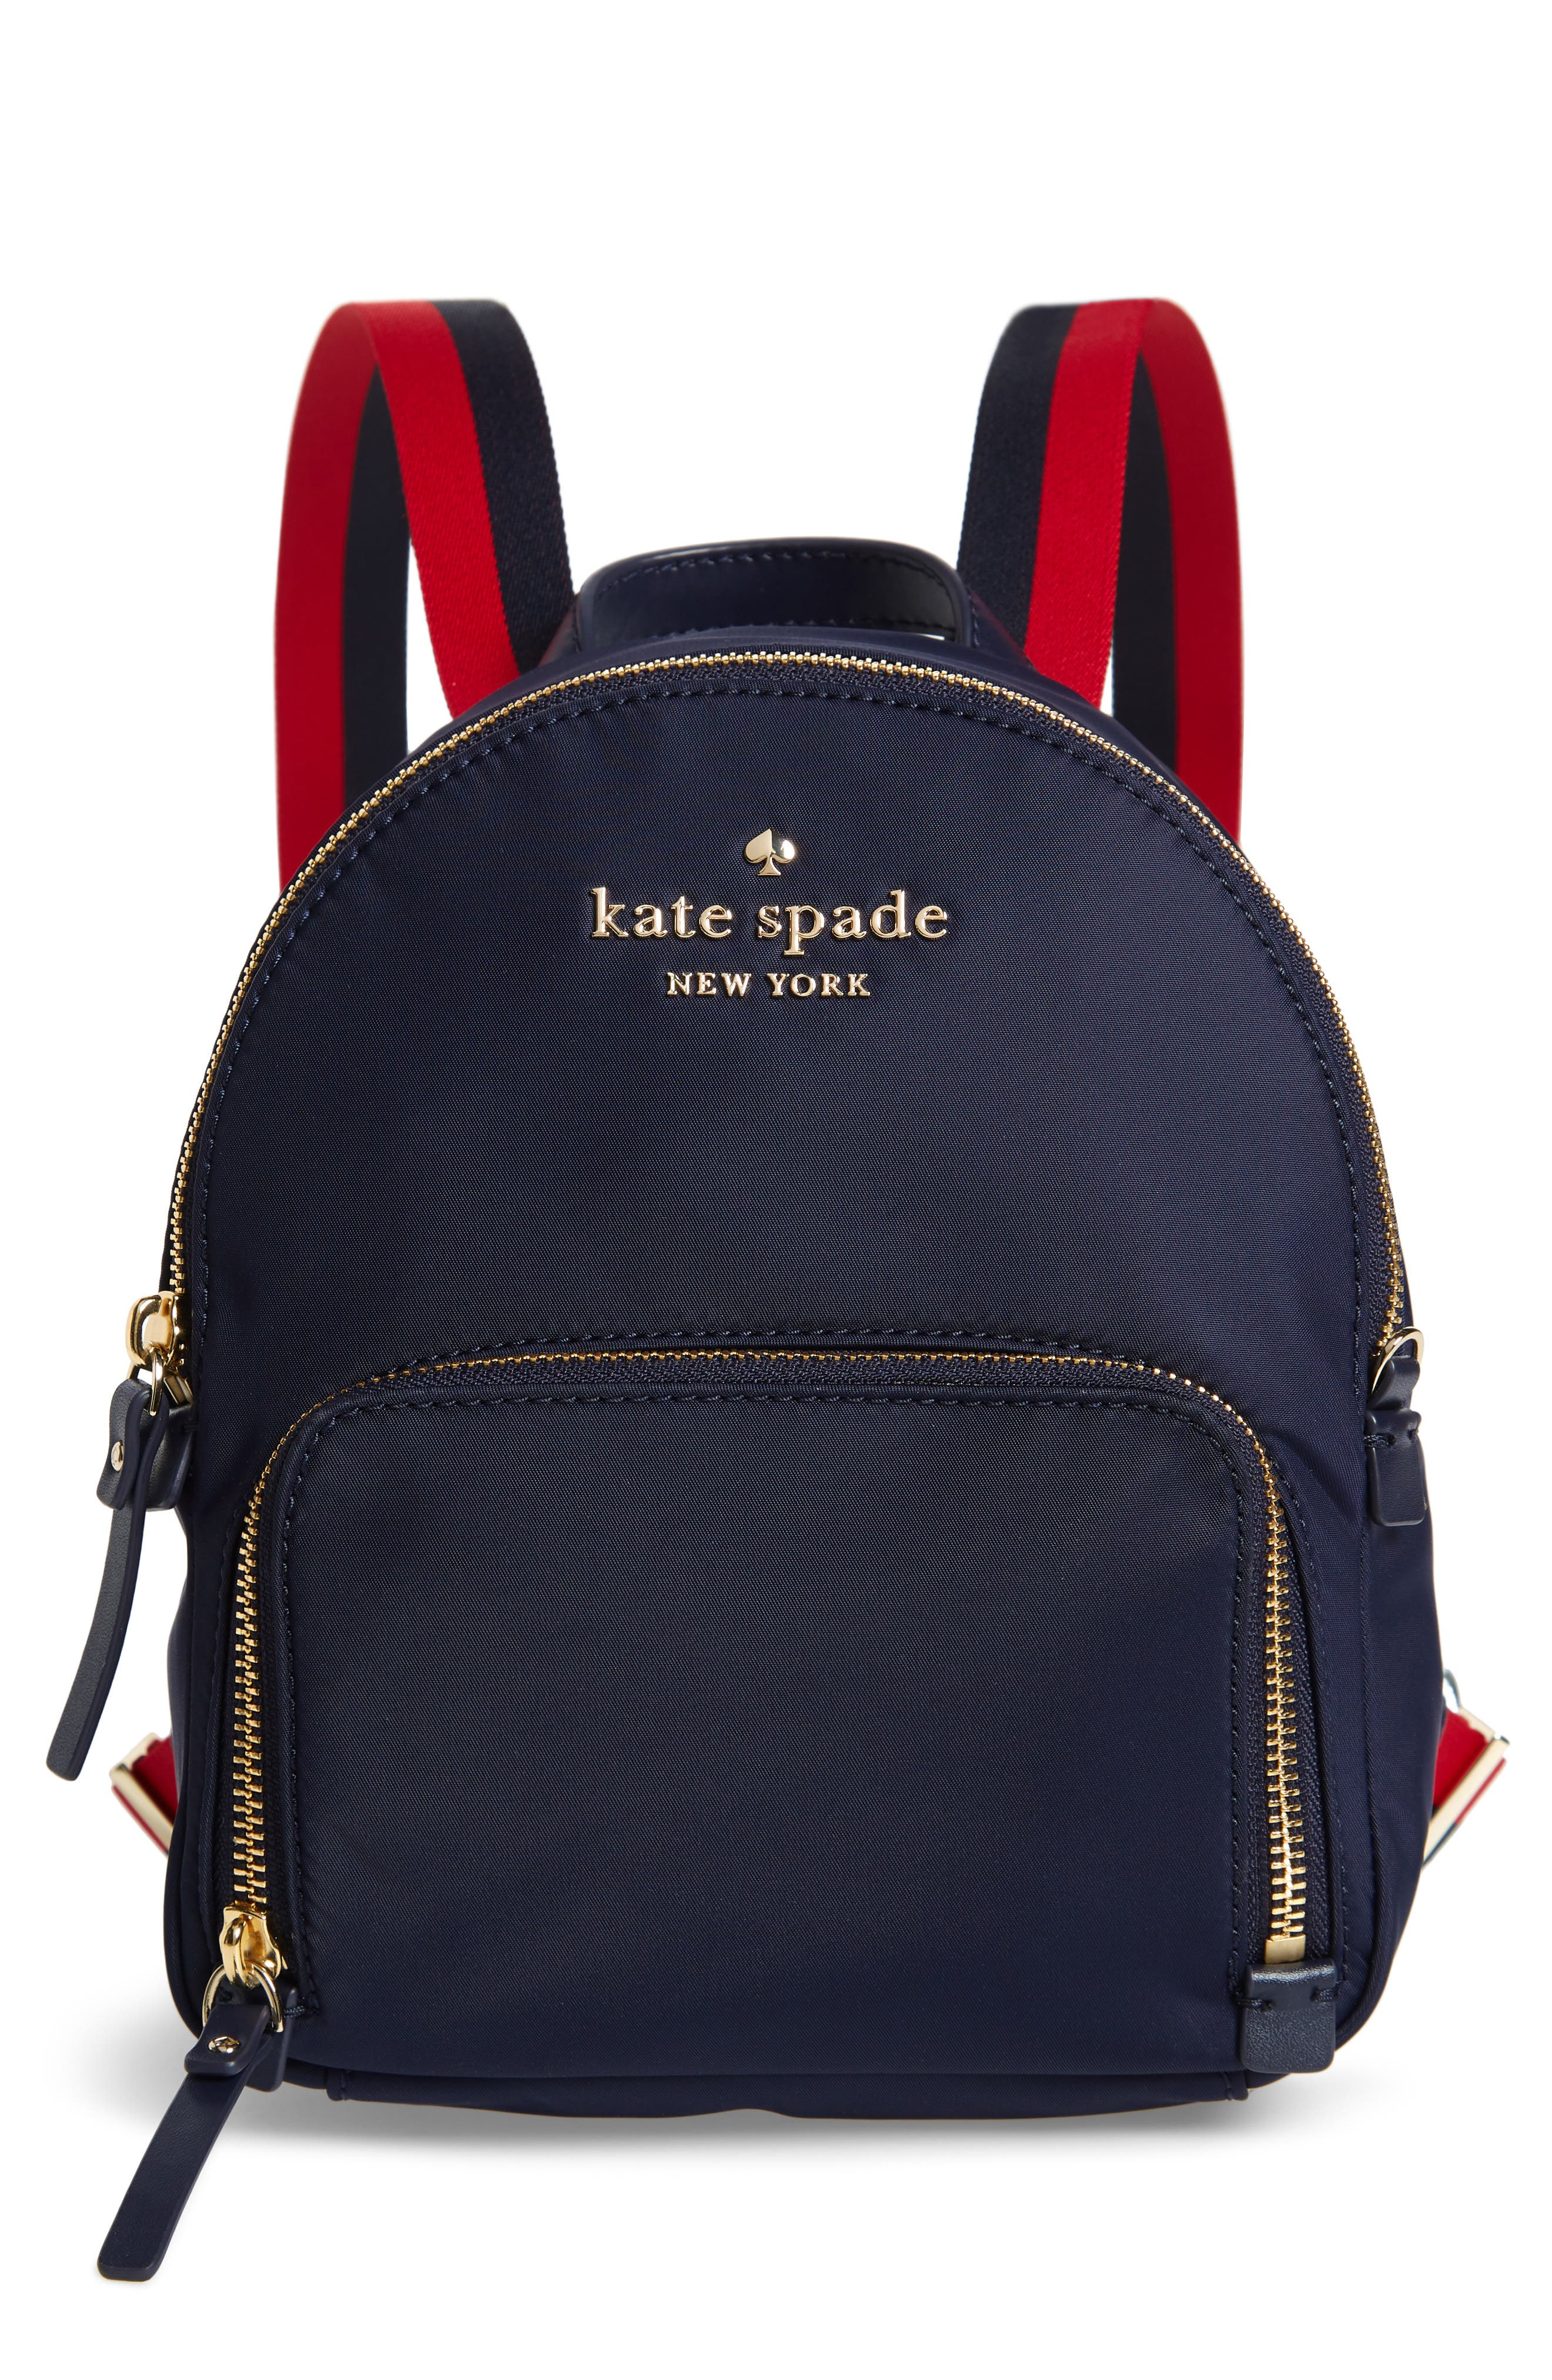 KATE SPADE NEW YORK kate spade watson lane varsity stripe small backpack, Main, color, 400